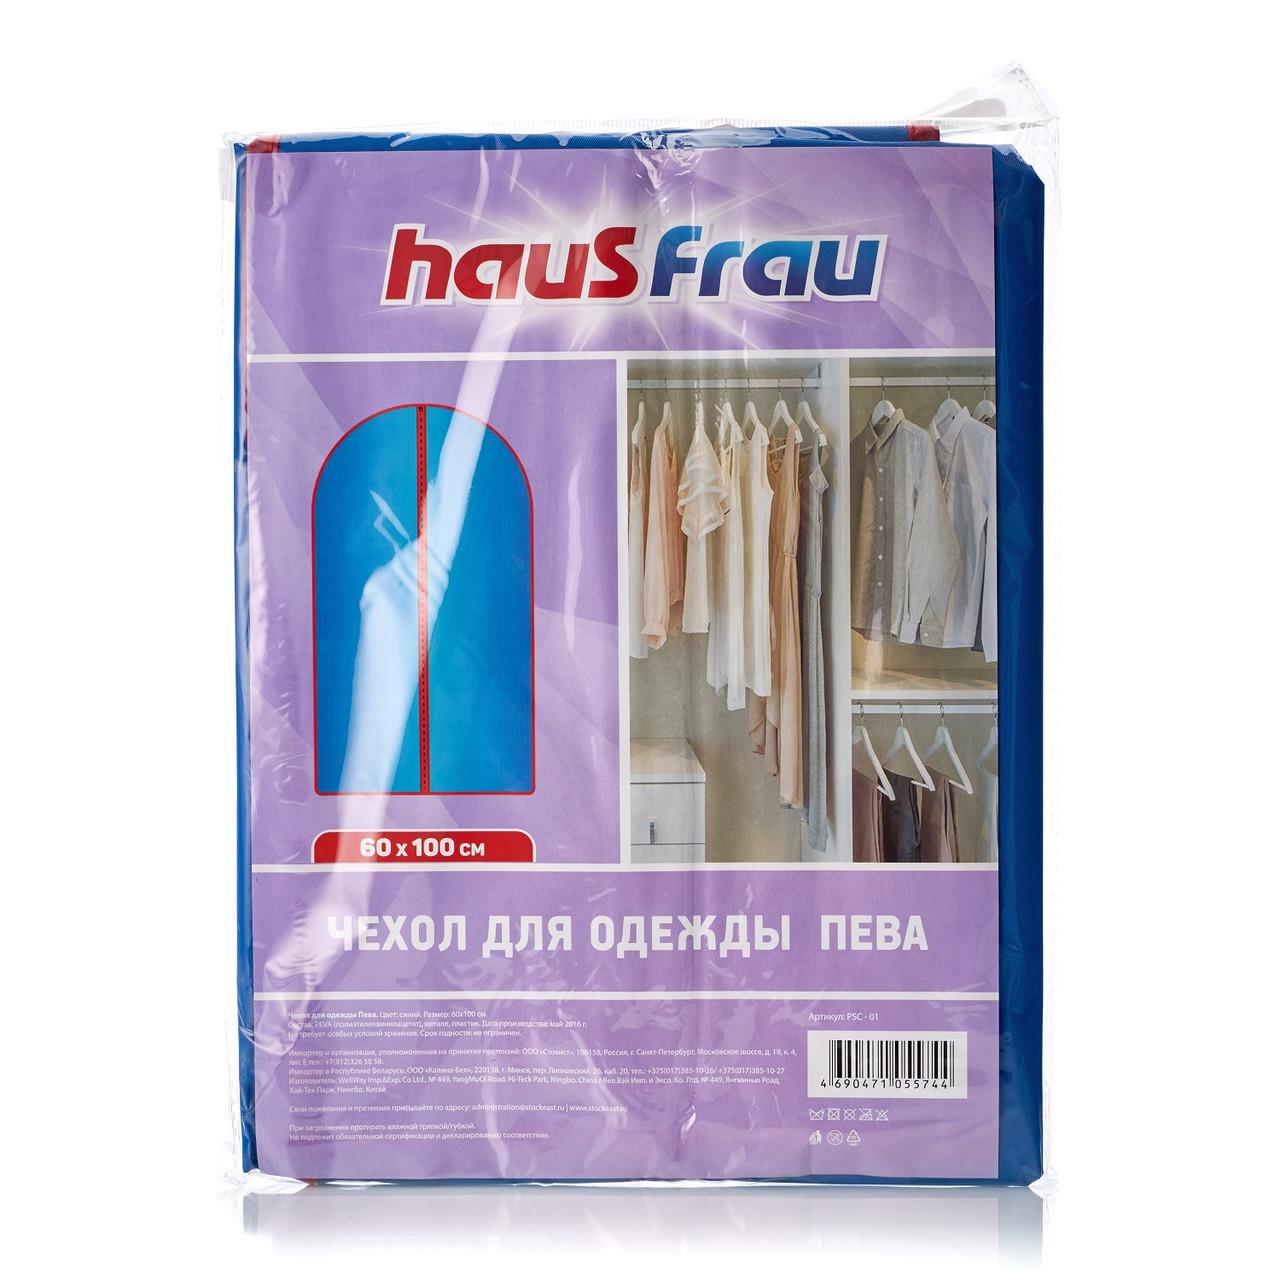 Чехол для одежды Хаус фрау - Haus Frau 60*100см